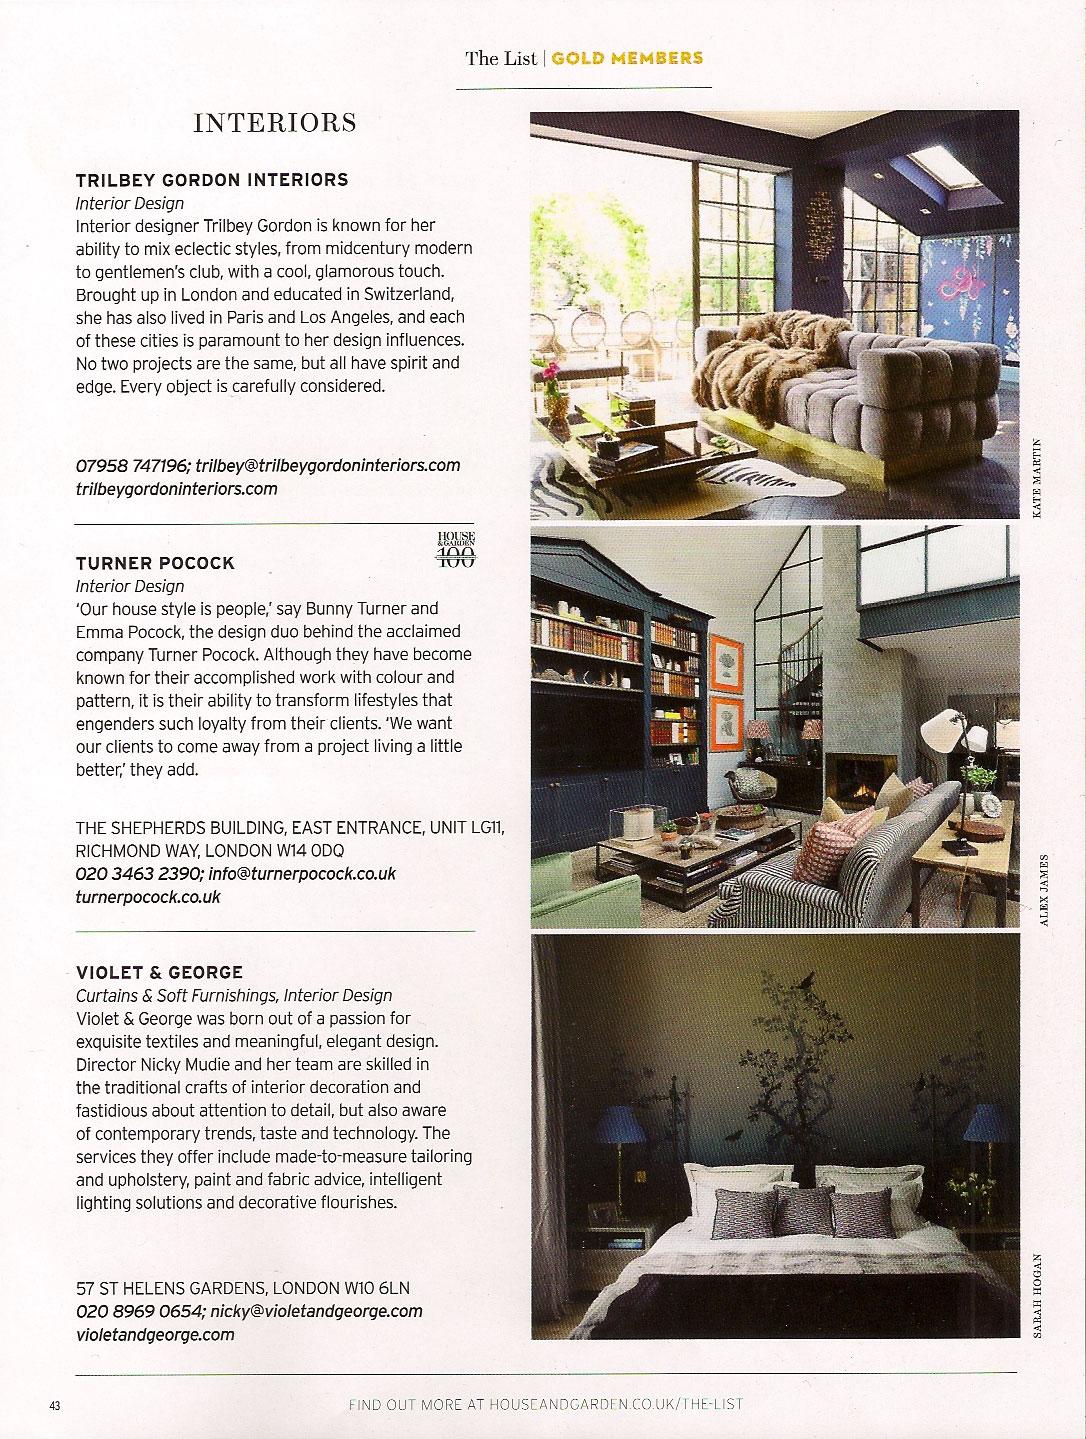 Trilbey Gordon Interiors Interior Design London